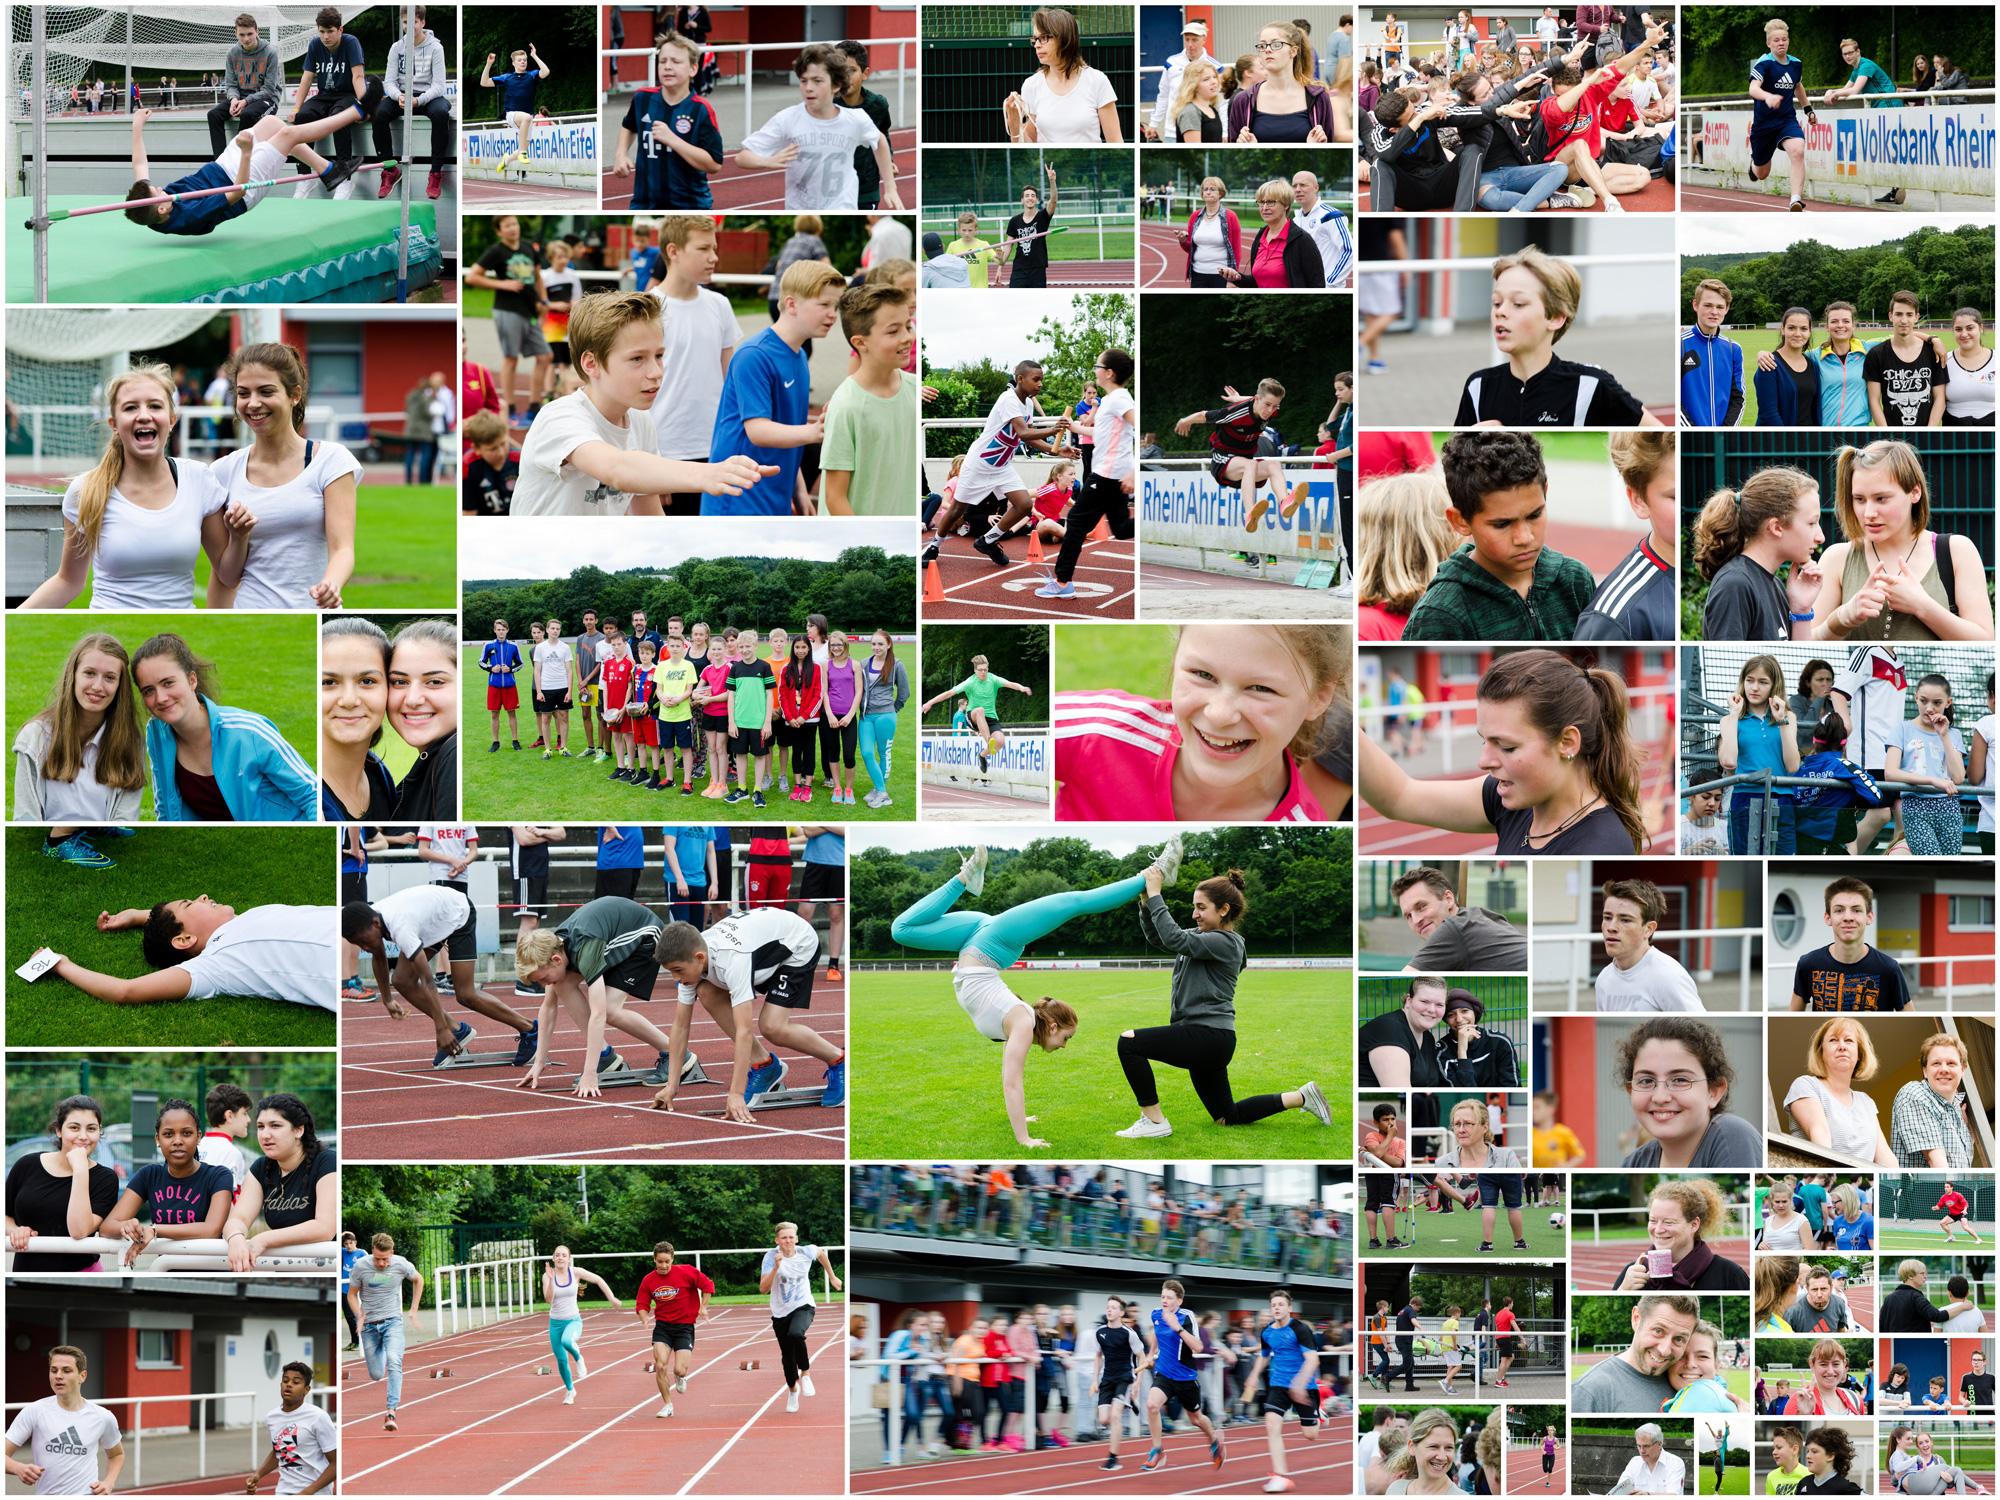 Bundesjugendspiele der Boeselager-Realschule Ahrweiler 2016